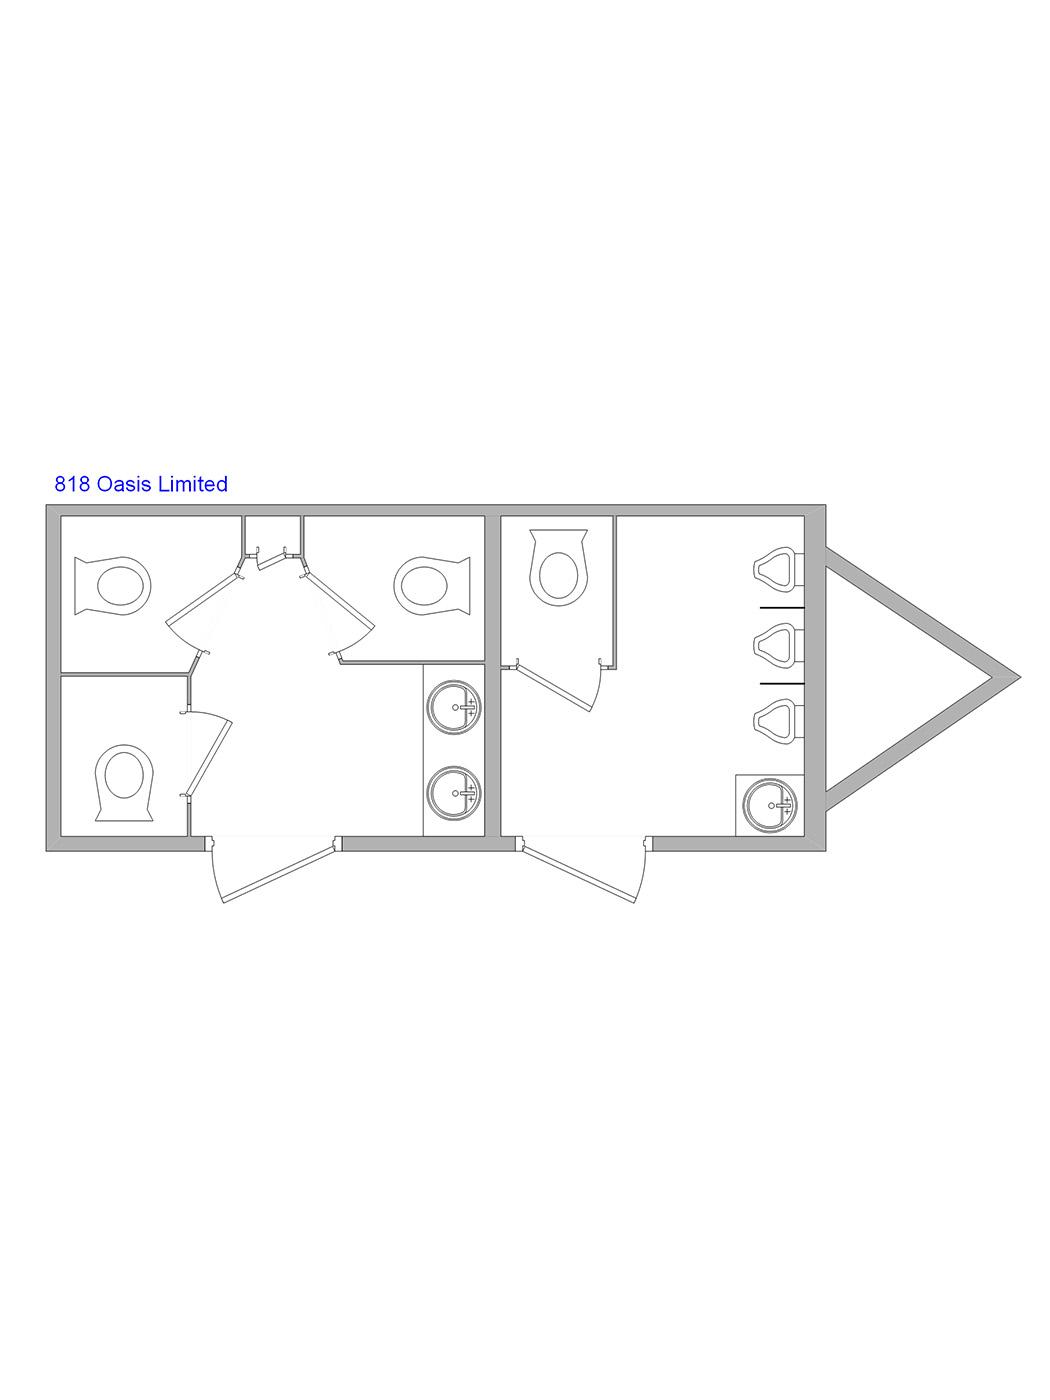 18-foot Luxury Restroom Trailer - image jj-luxury-restroom-trailer-floorplan-18ft on https://jimmysjohnnys.com